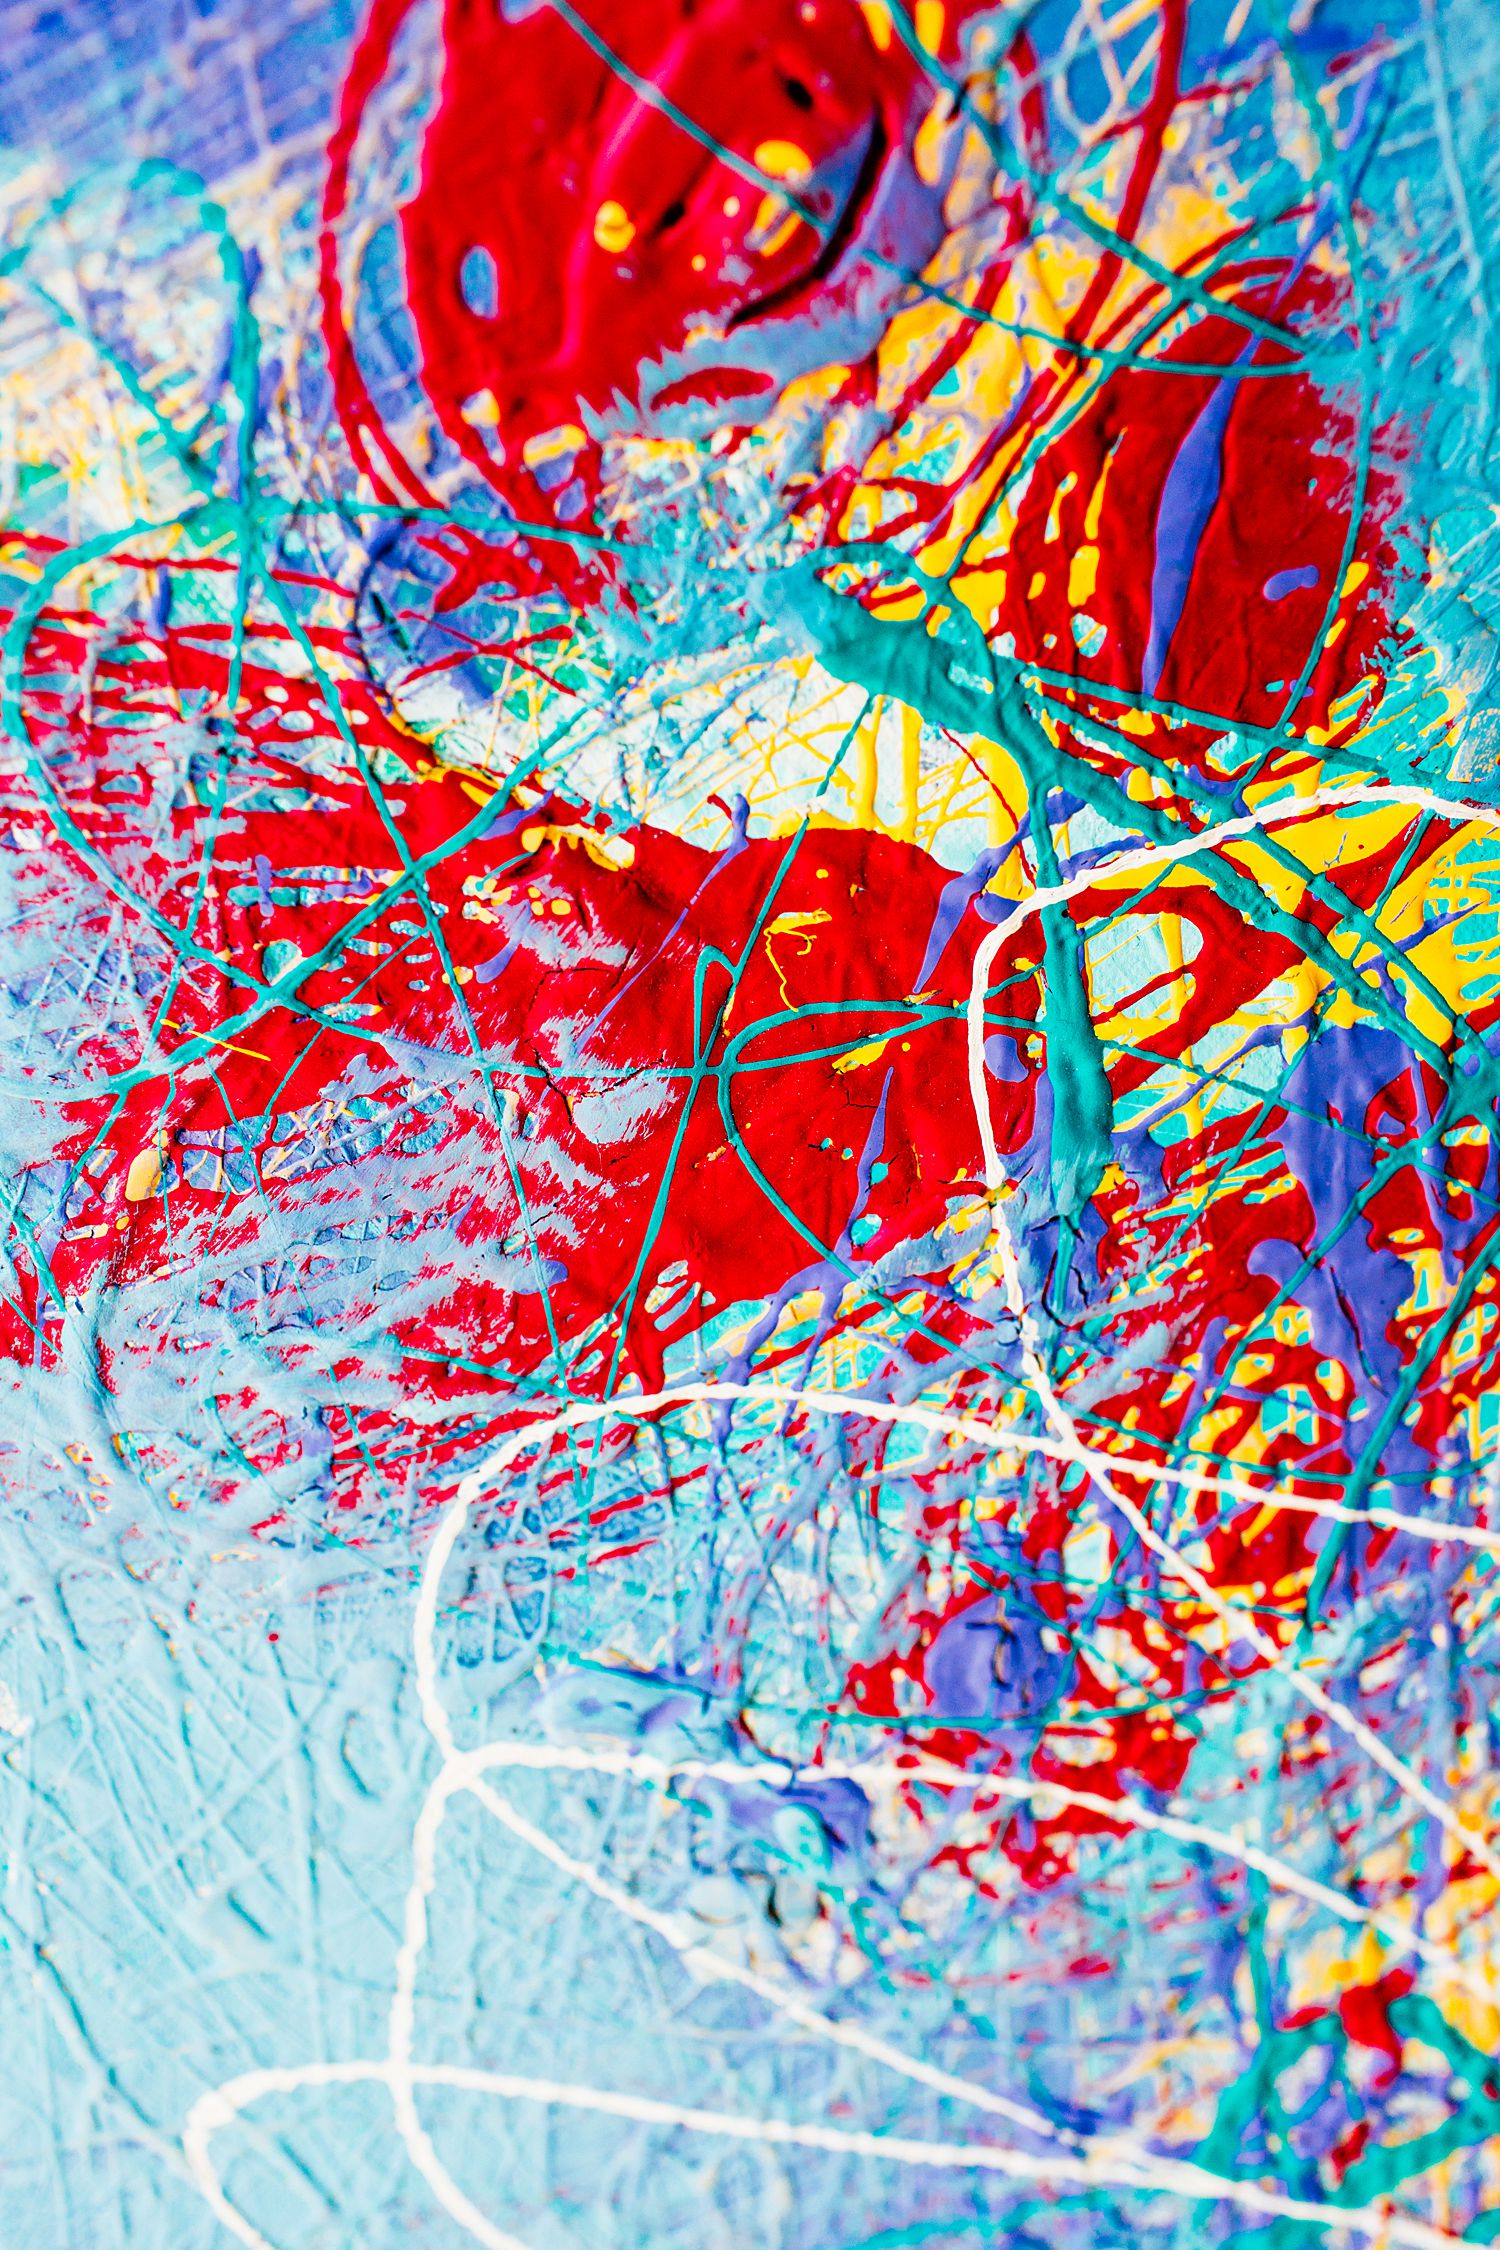 Cha Wilde Paintings - February 2019 - Life, I'm Afraid of Her-3_WEB.jpg